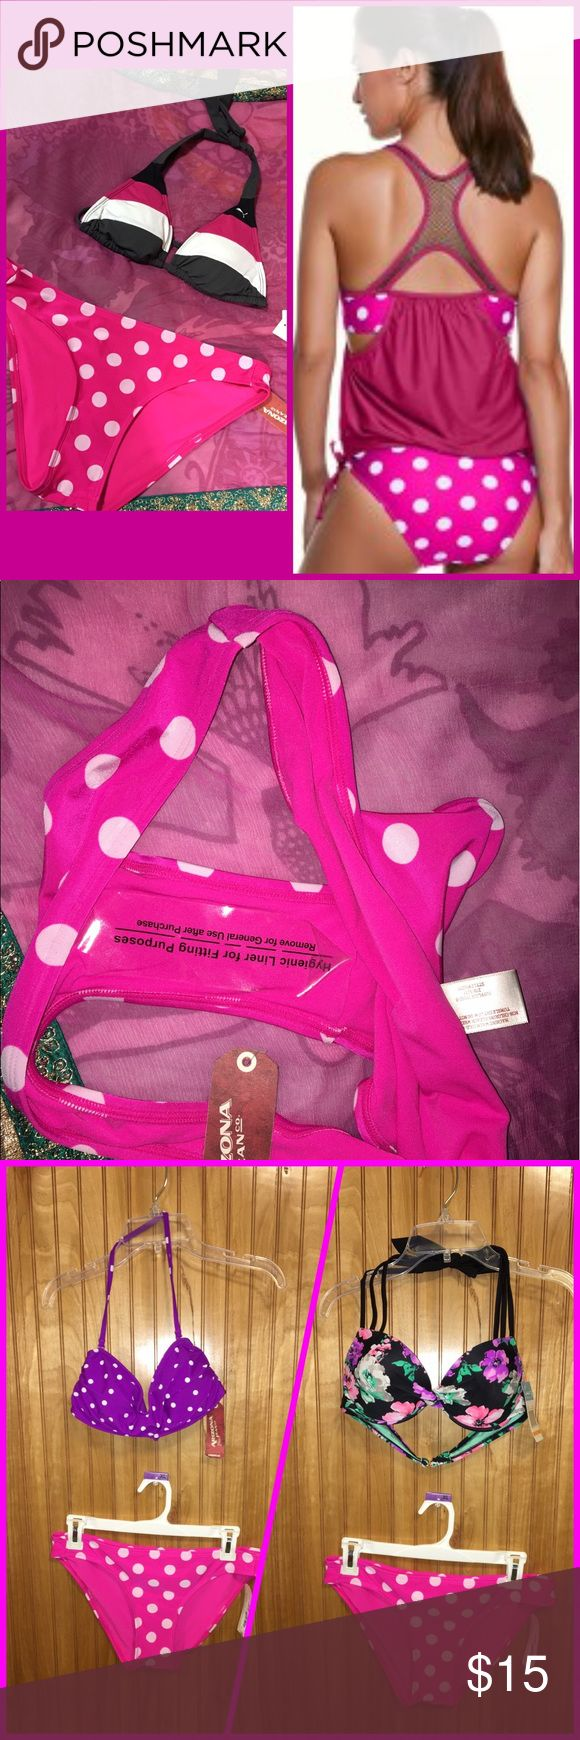 "BOGO 🆓Arizona Pink Polka Dot Bikini Bottom Sz M Cute and versatile Polka dot swim bottom. Is a size Juniors Medium, which is best for a 37-38.5""Hip. Can mix and match with other tops. NWT. Arizona Jean Company Swim Bikinis"